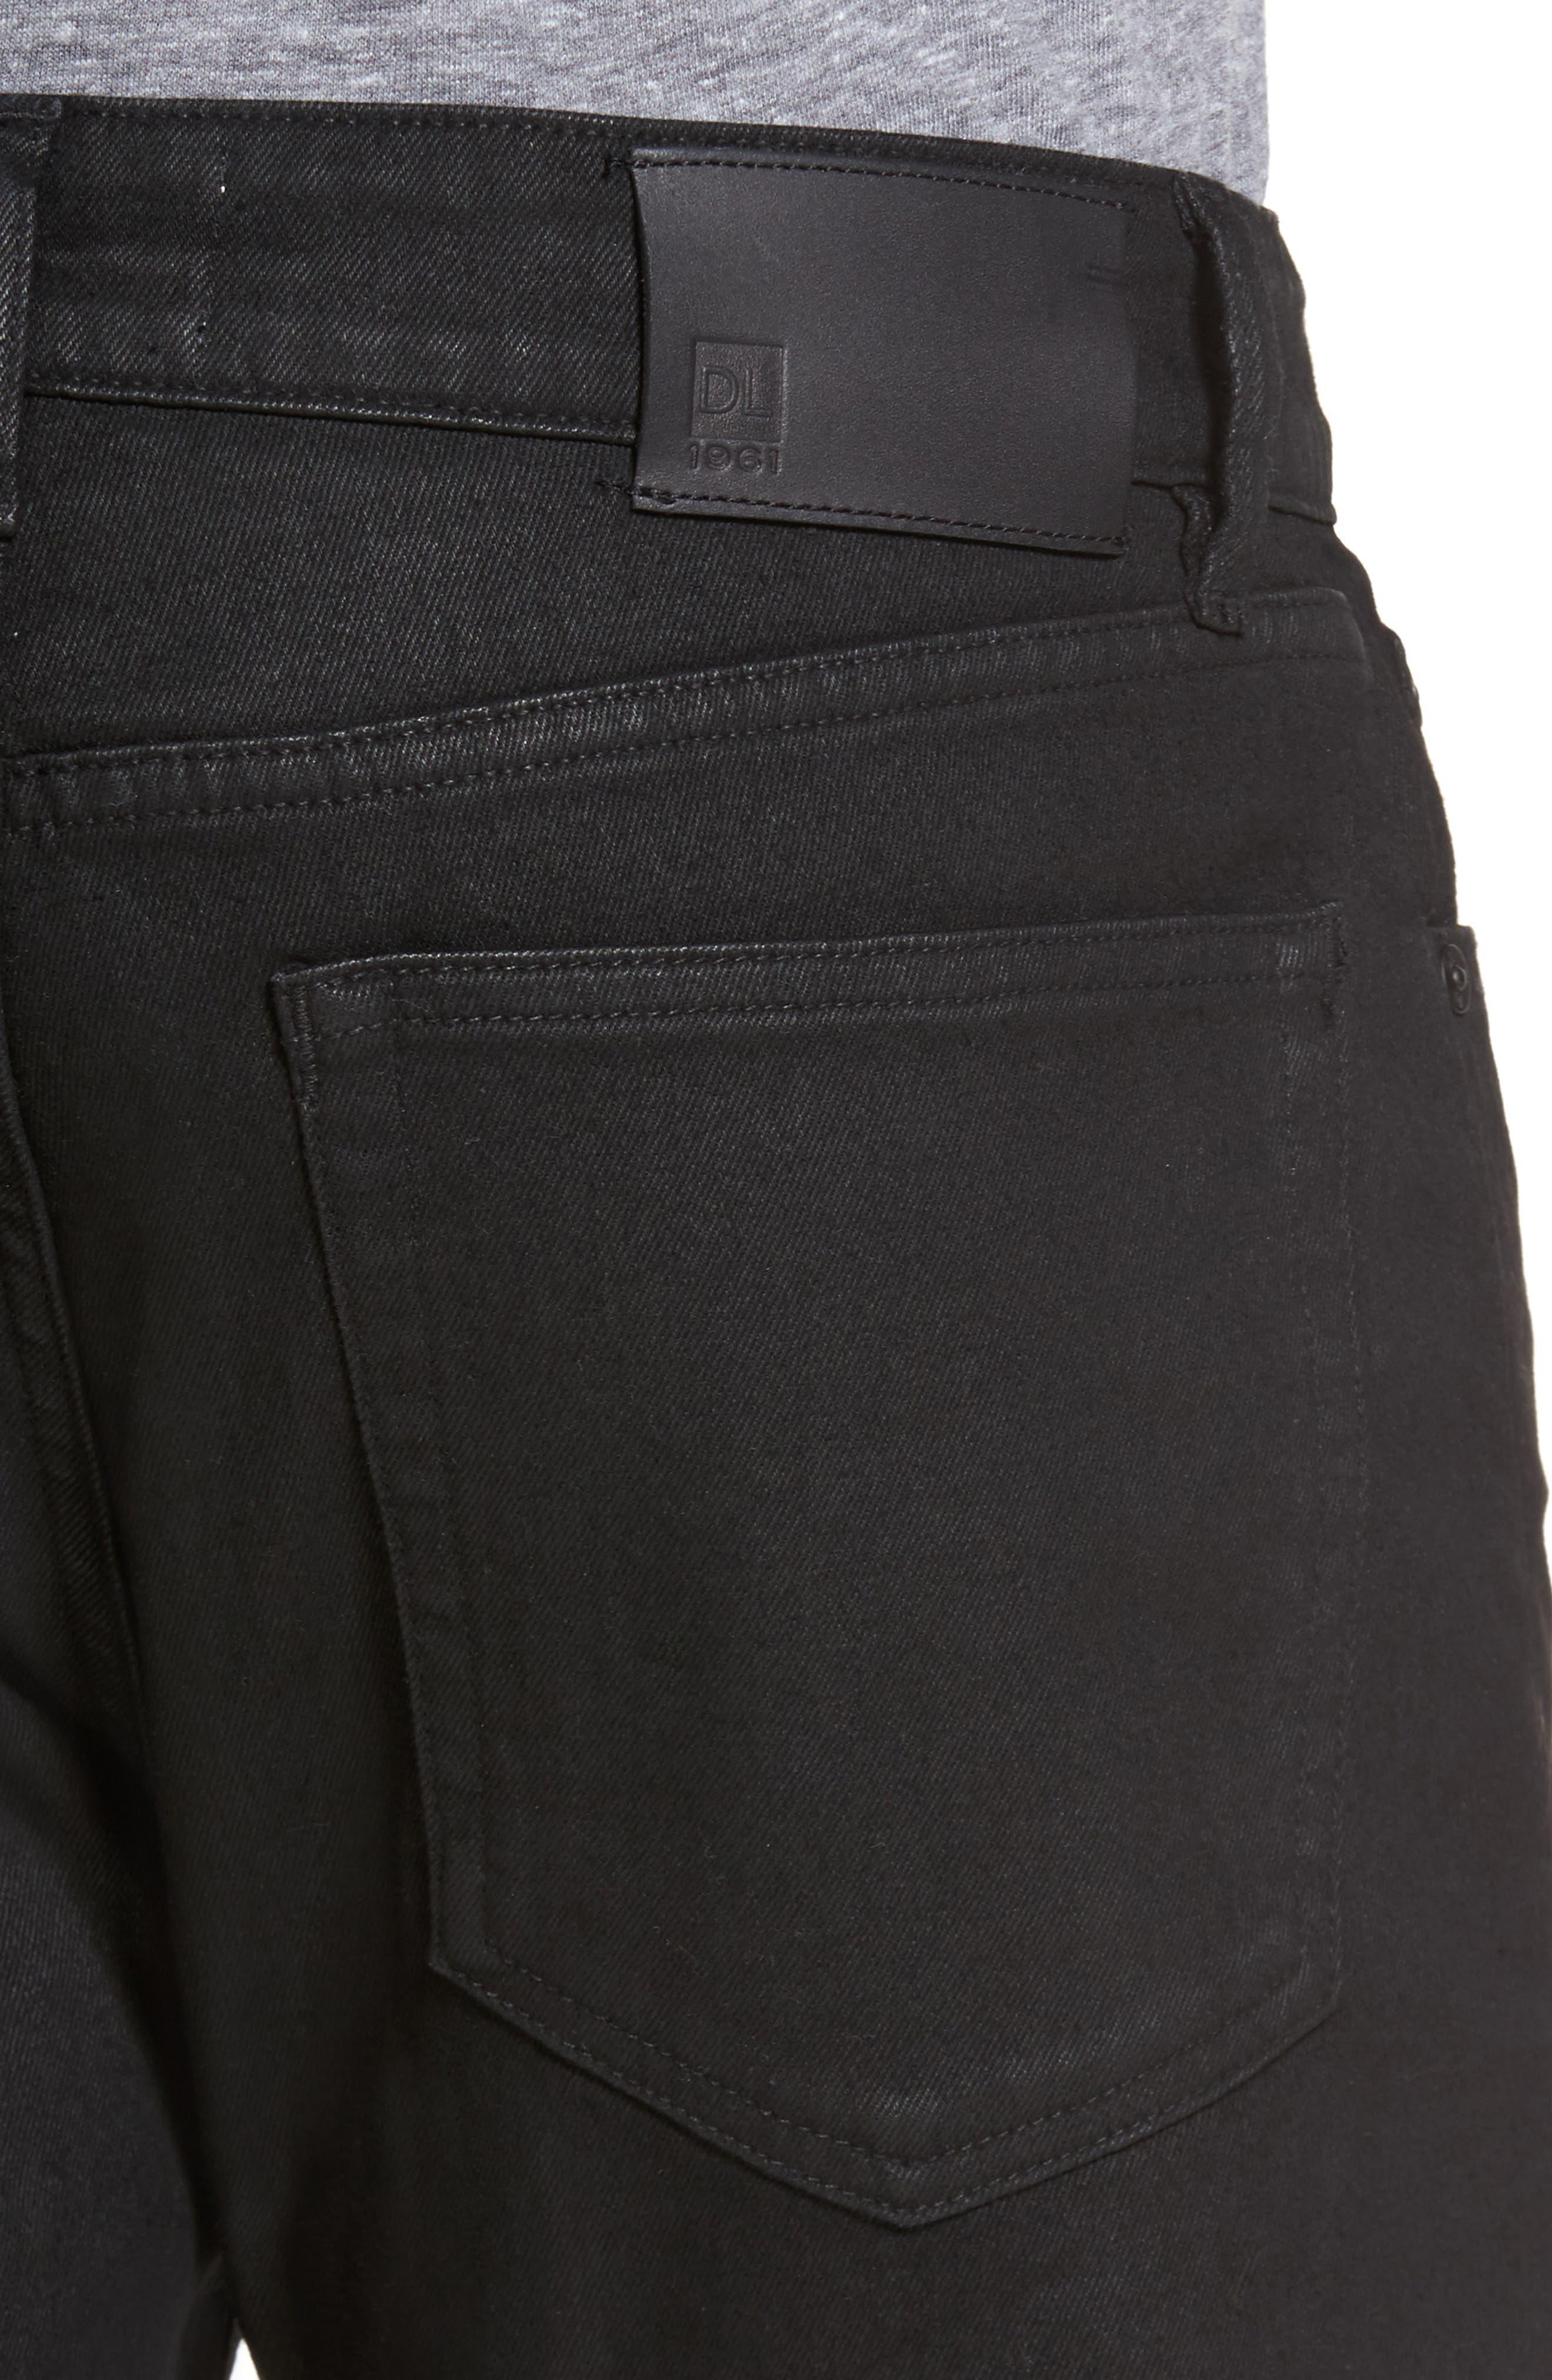 Hunter Skinny Jeans,                             Alternate thumbnail 4, color,                             Vice